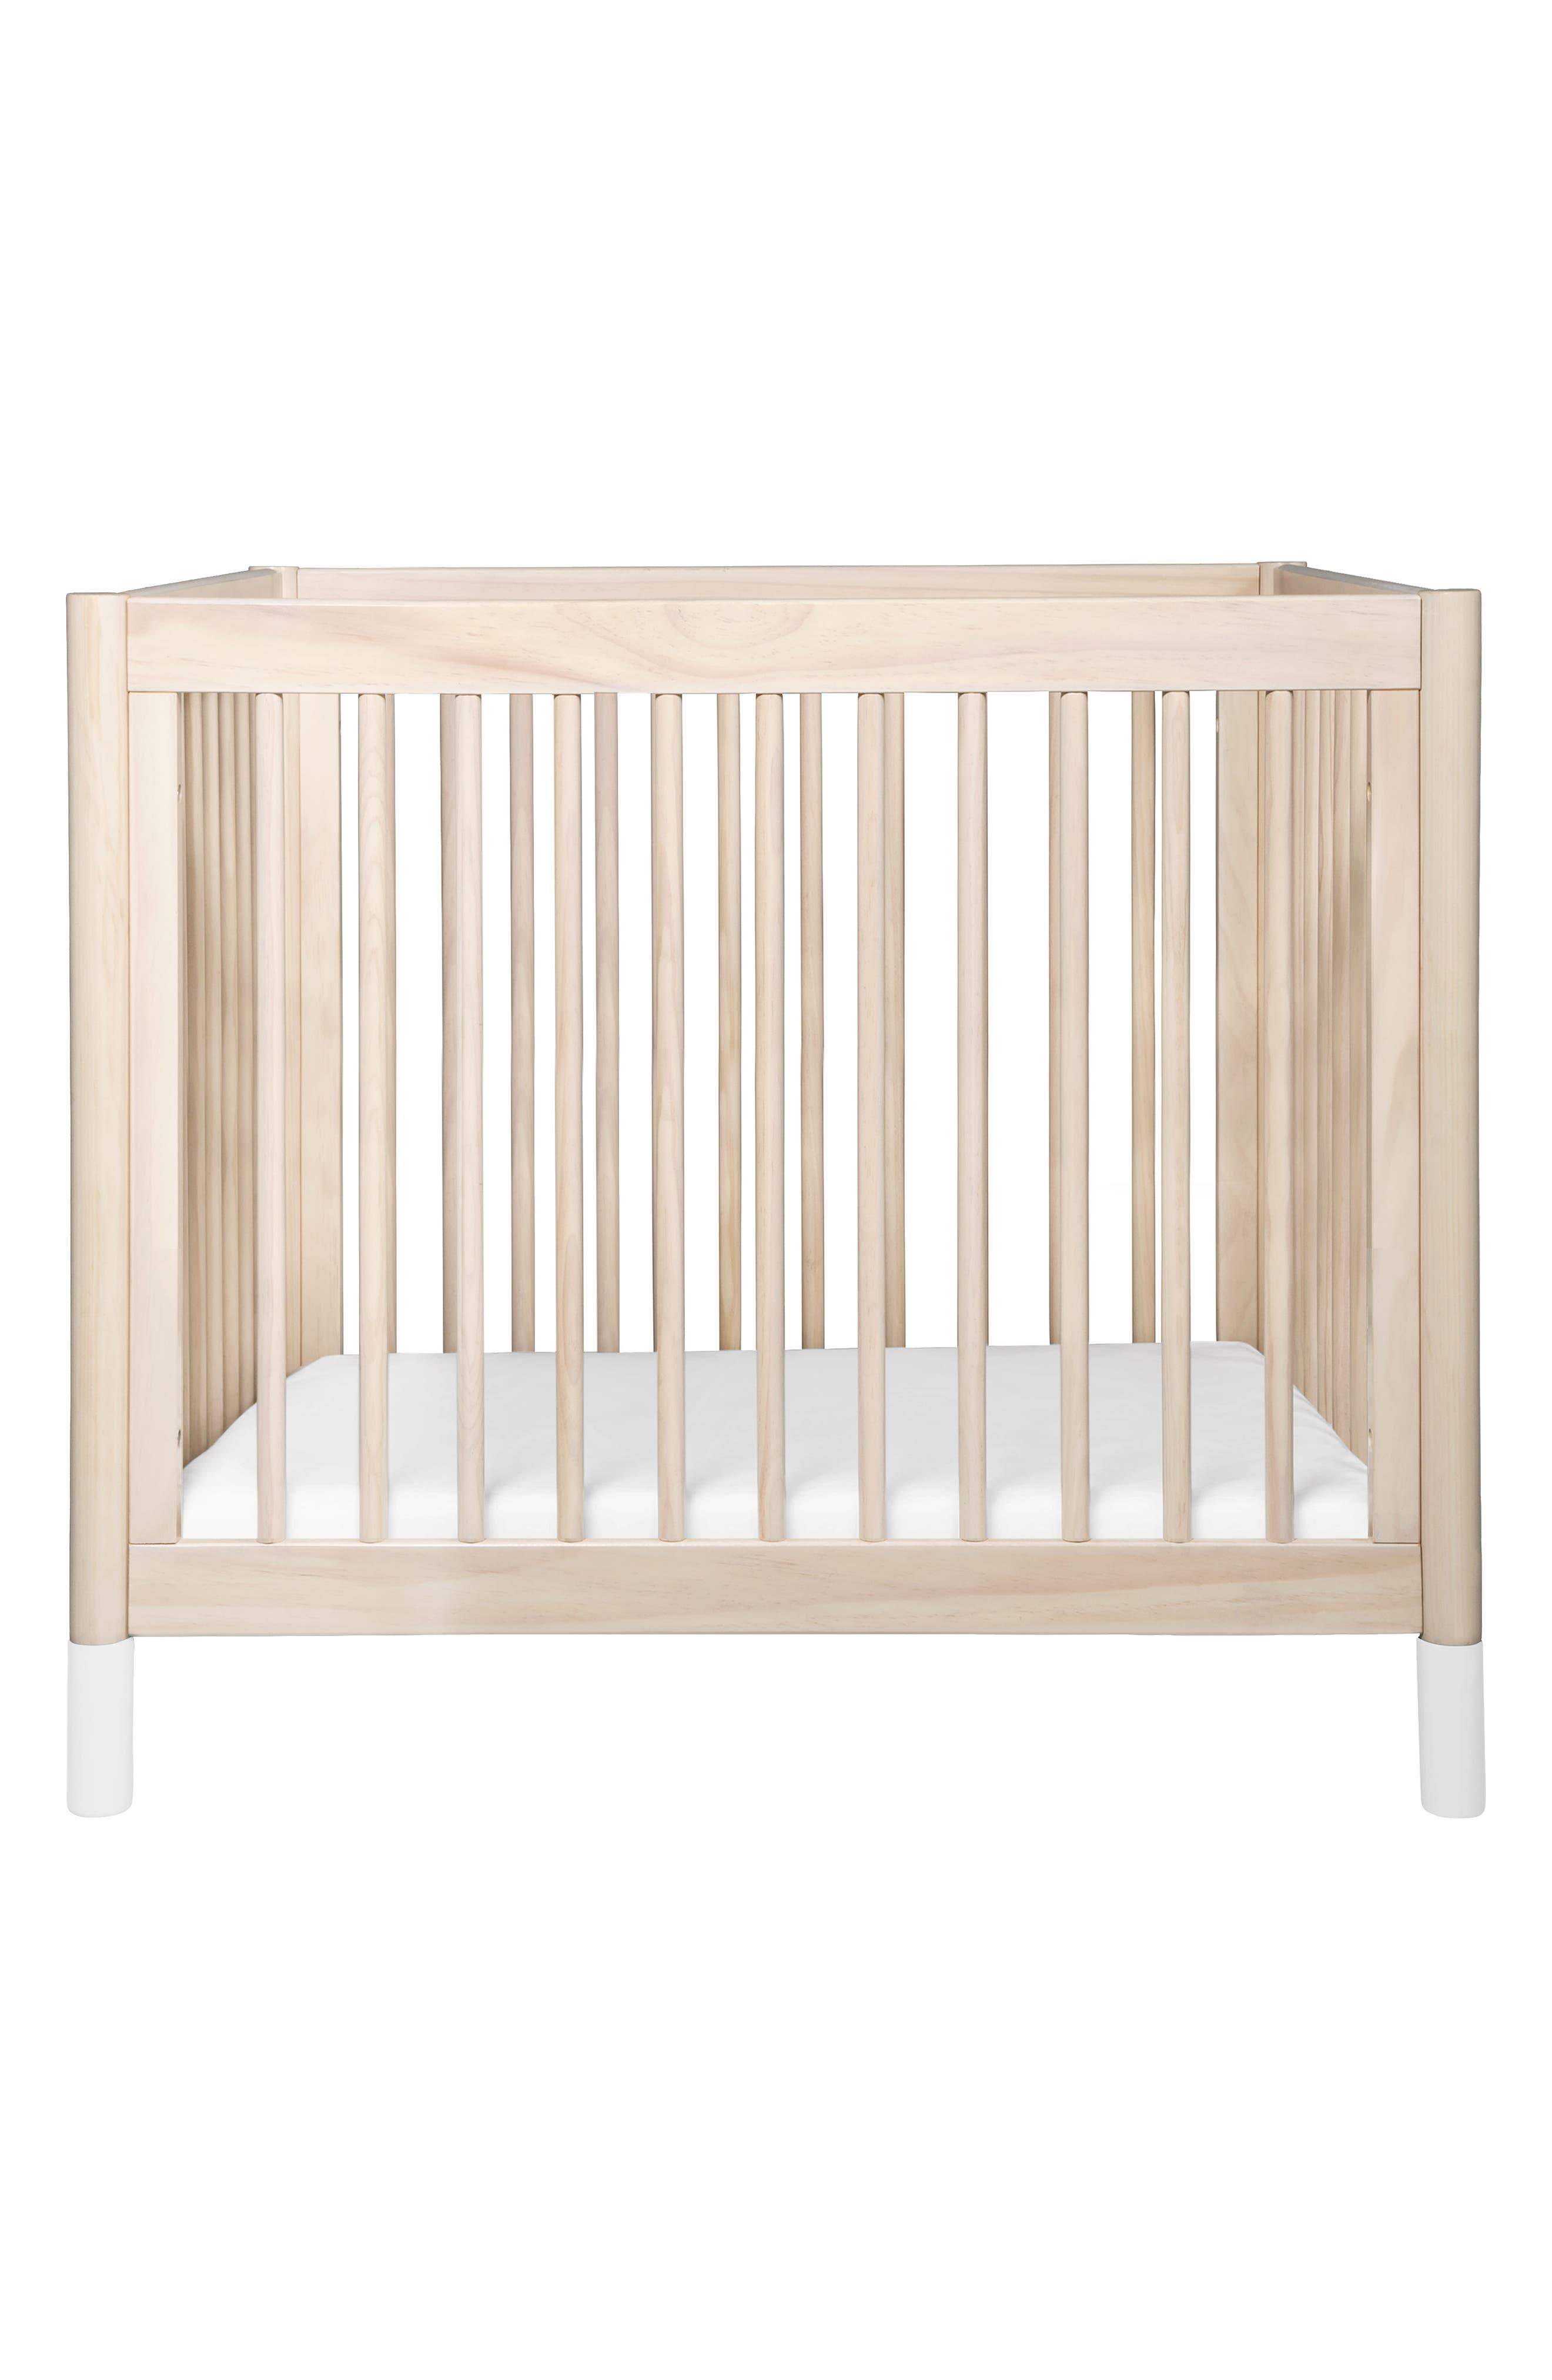 Gelato Mini Crib,                             Alternate thumbnail 2, color,                             Washed Natural And White